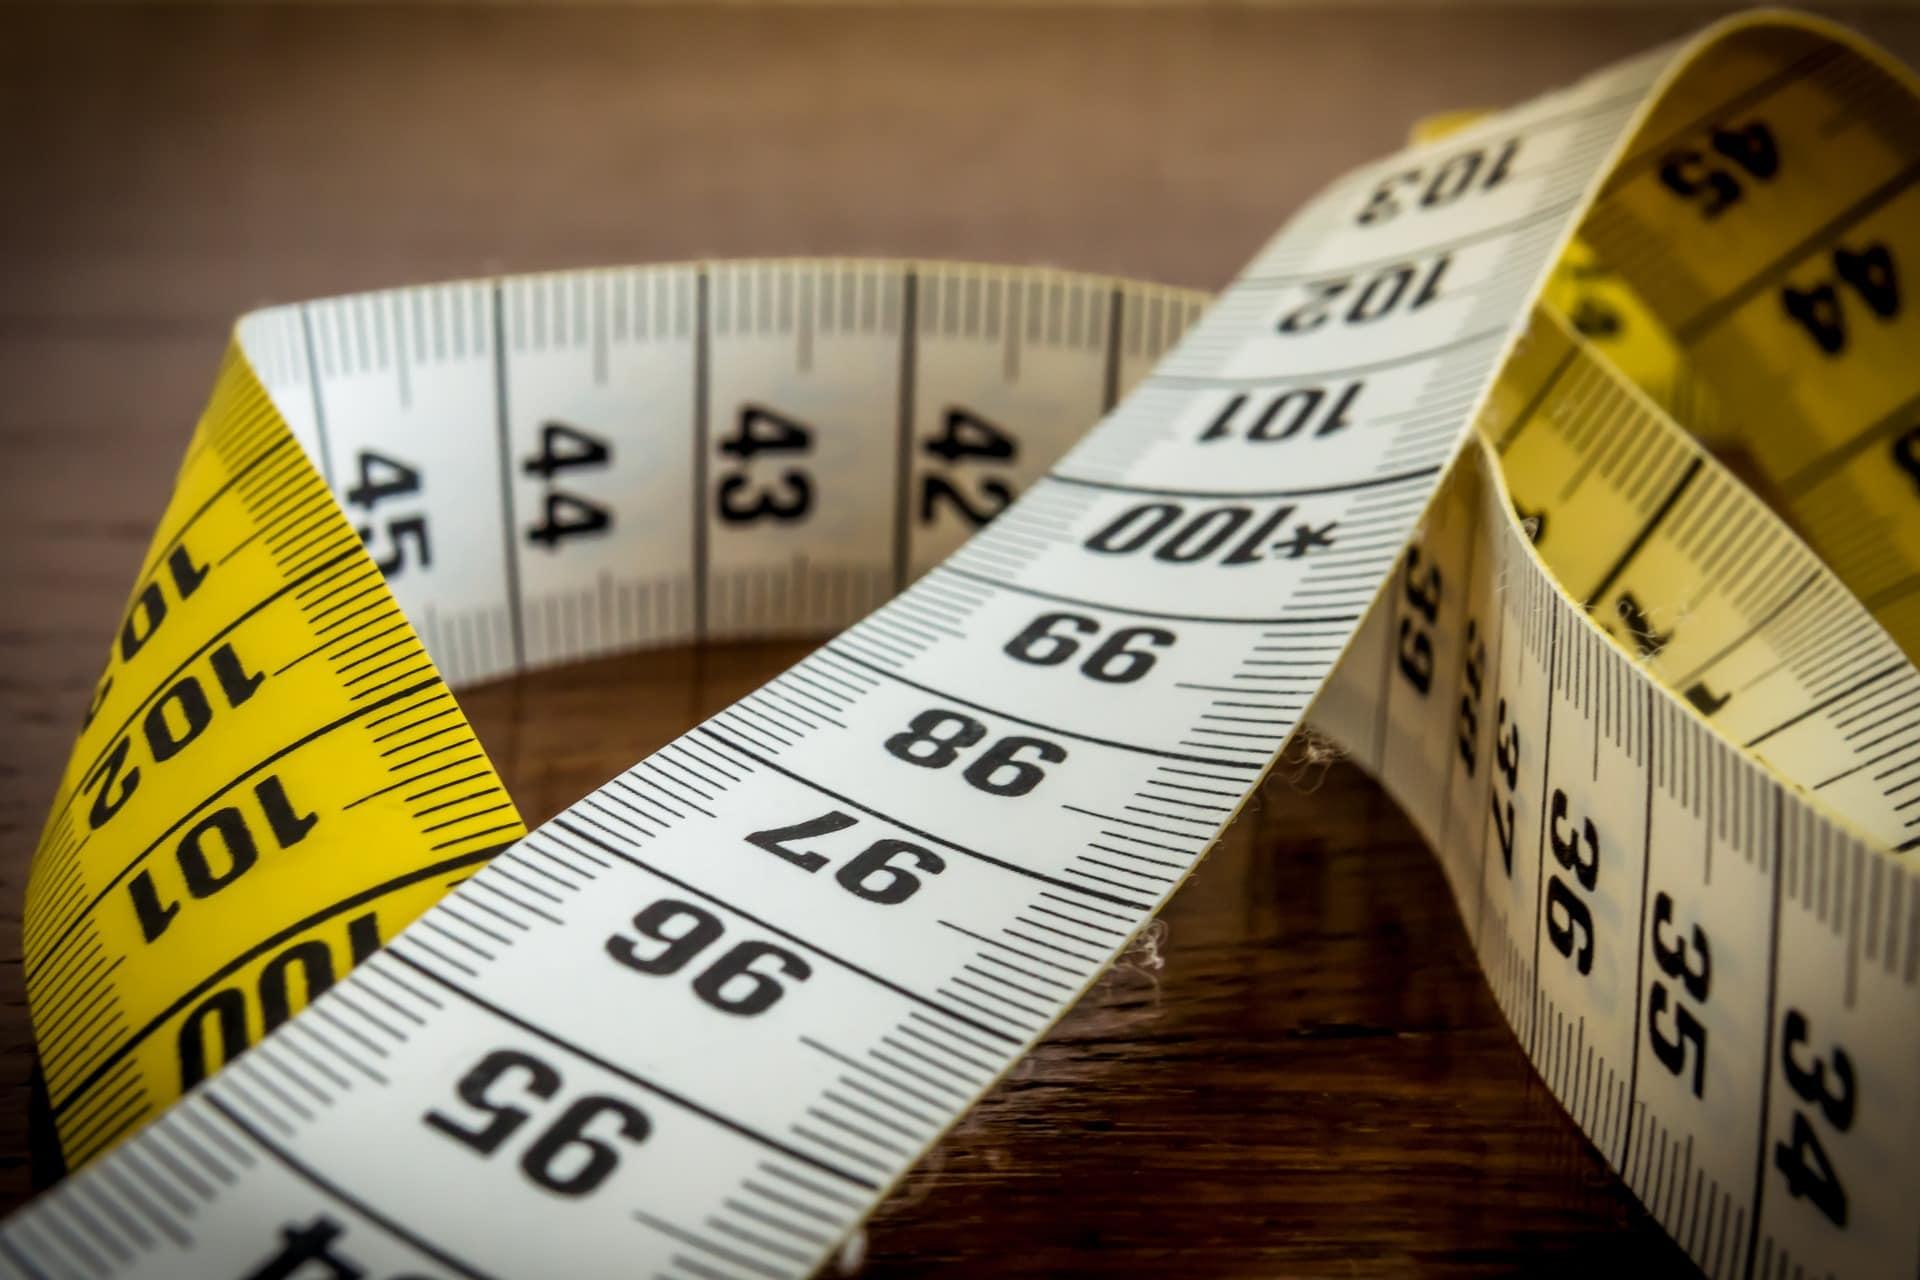 tape-measure-1186496_1920